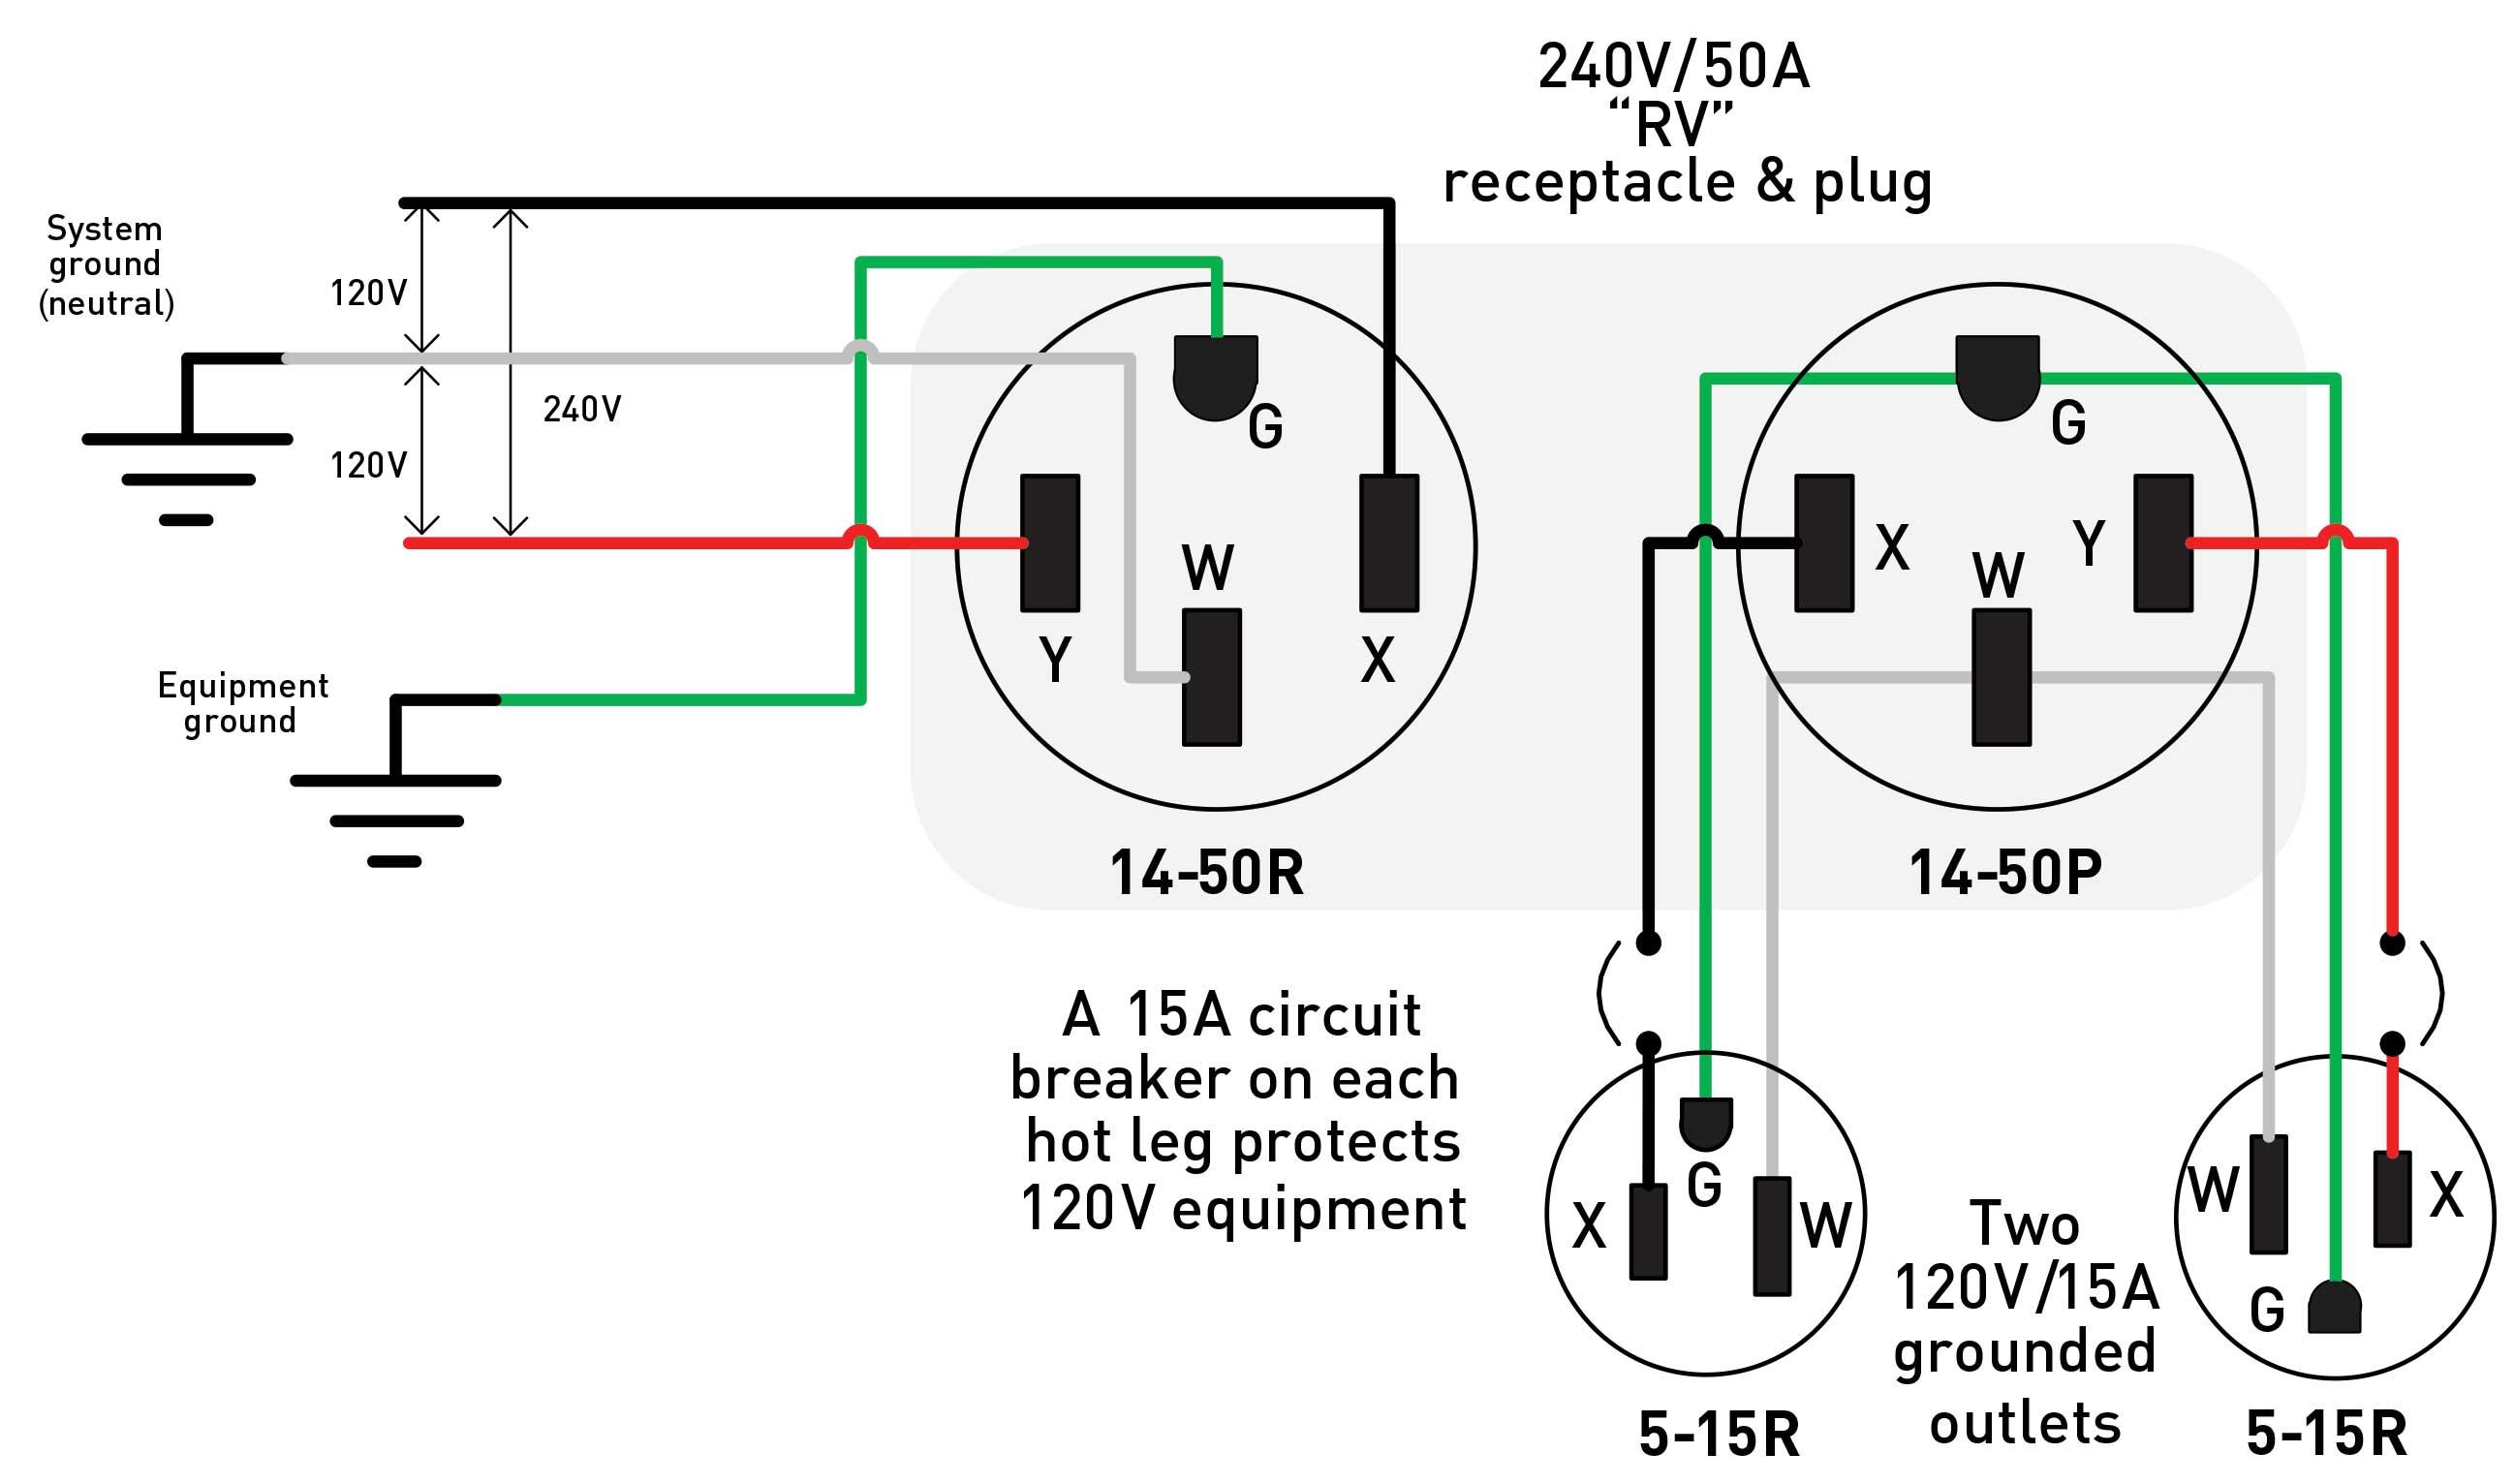 240v Switch Wiring Diagram Daily Update Rv Relay 480v Photocell Light Australia